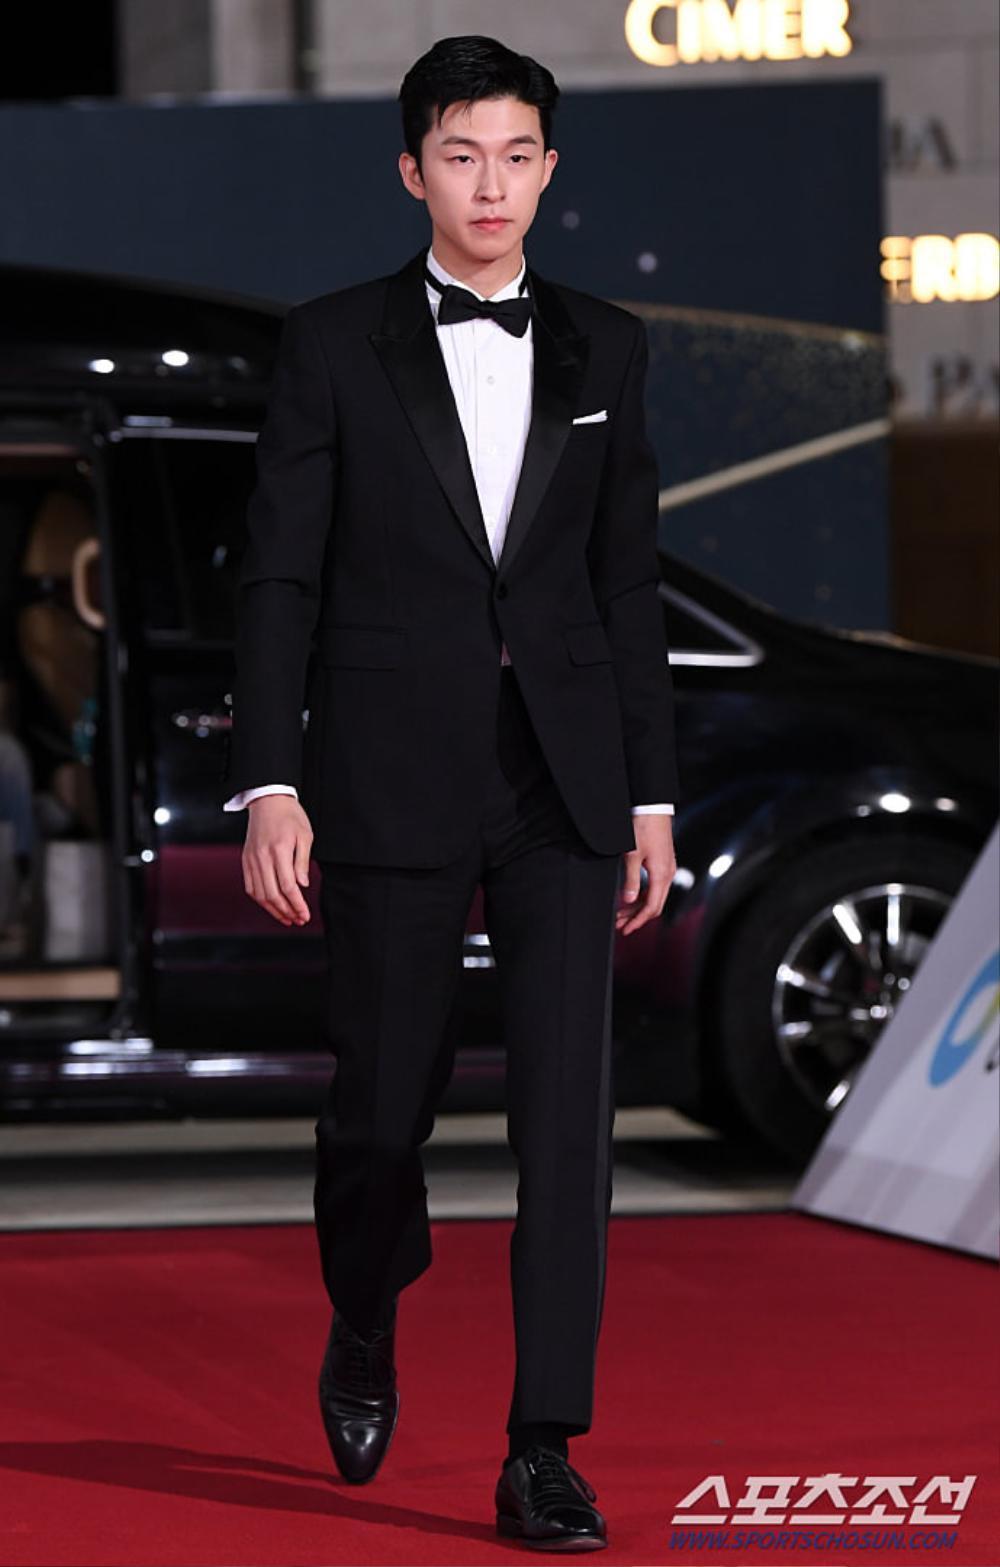 Thảm đỏ 'Rồng xanh 2020': Shin Hye Sun 'cân sắc' Shin Min Ah, Jung Woo Sung - Lee Byung Hun điển trai! Ảnh 46